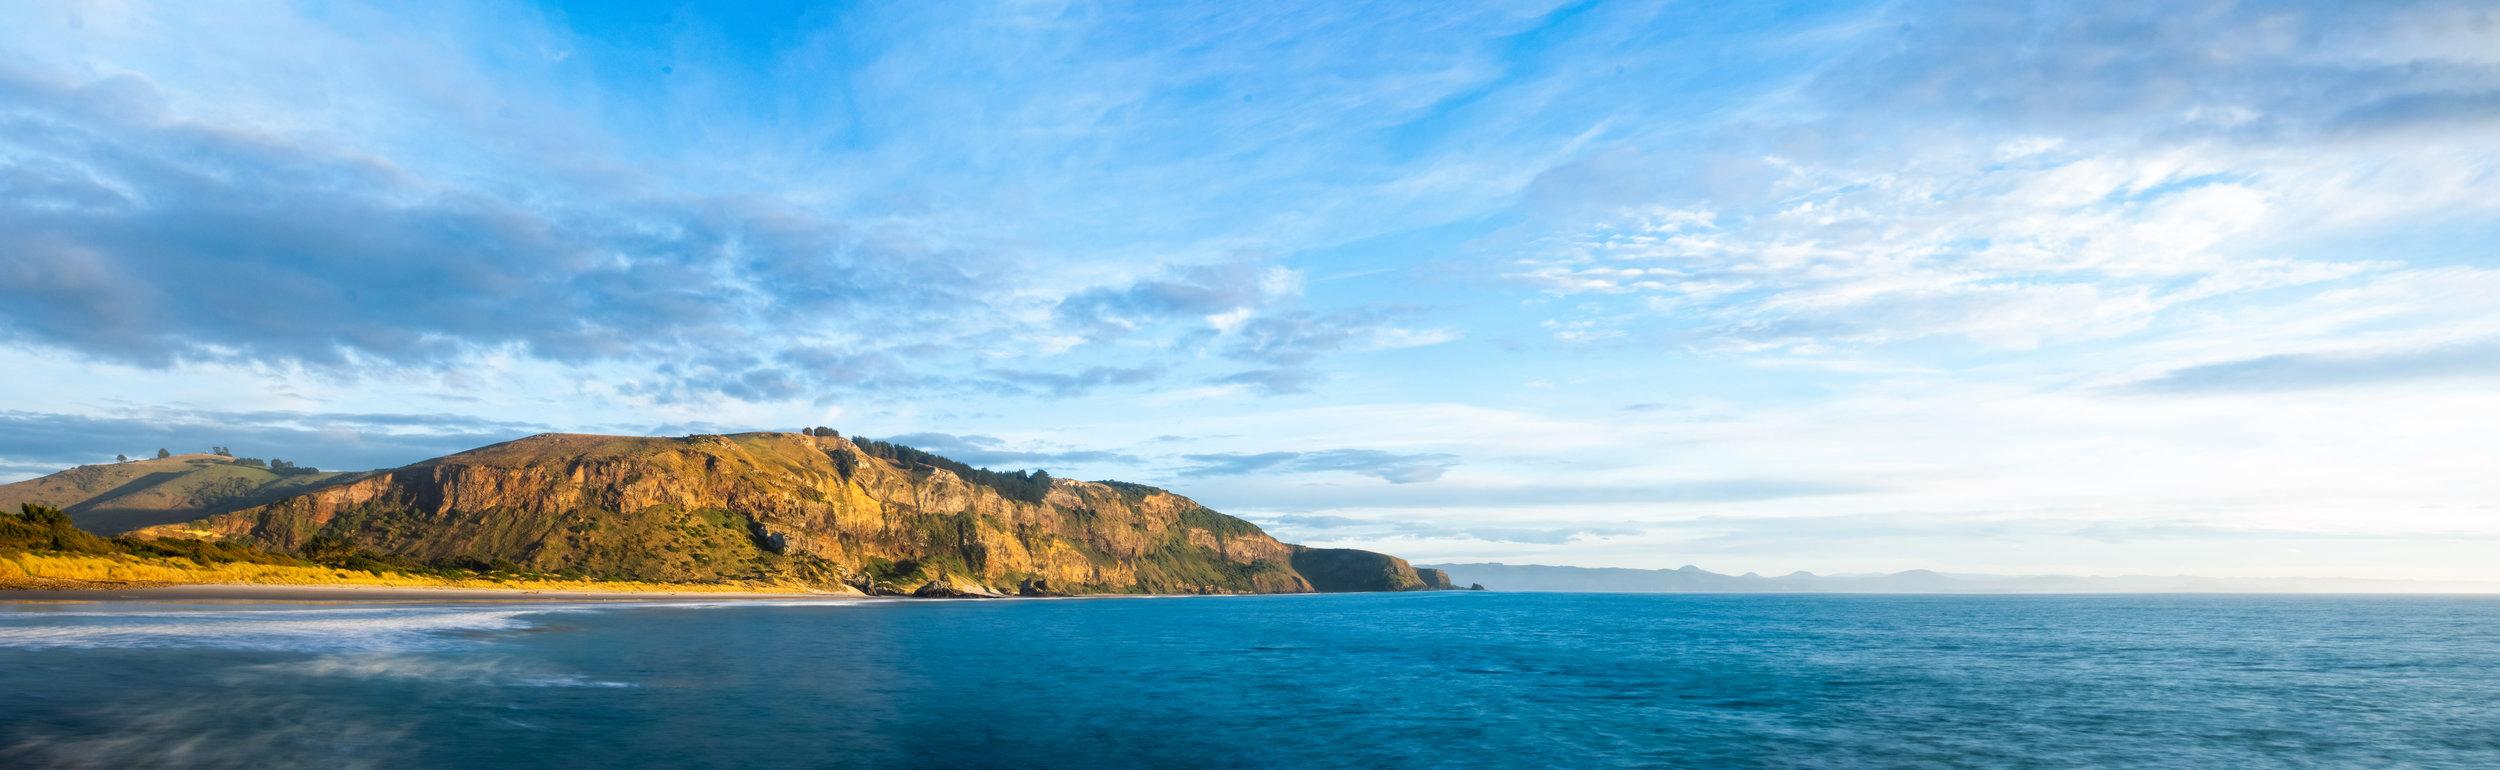 Panorama 14 Blue Aramoana Beach 16.06.18 150dpi.jpg